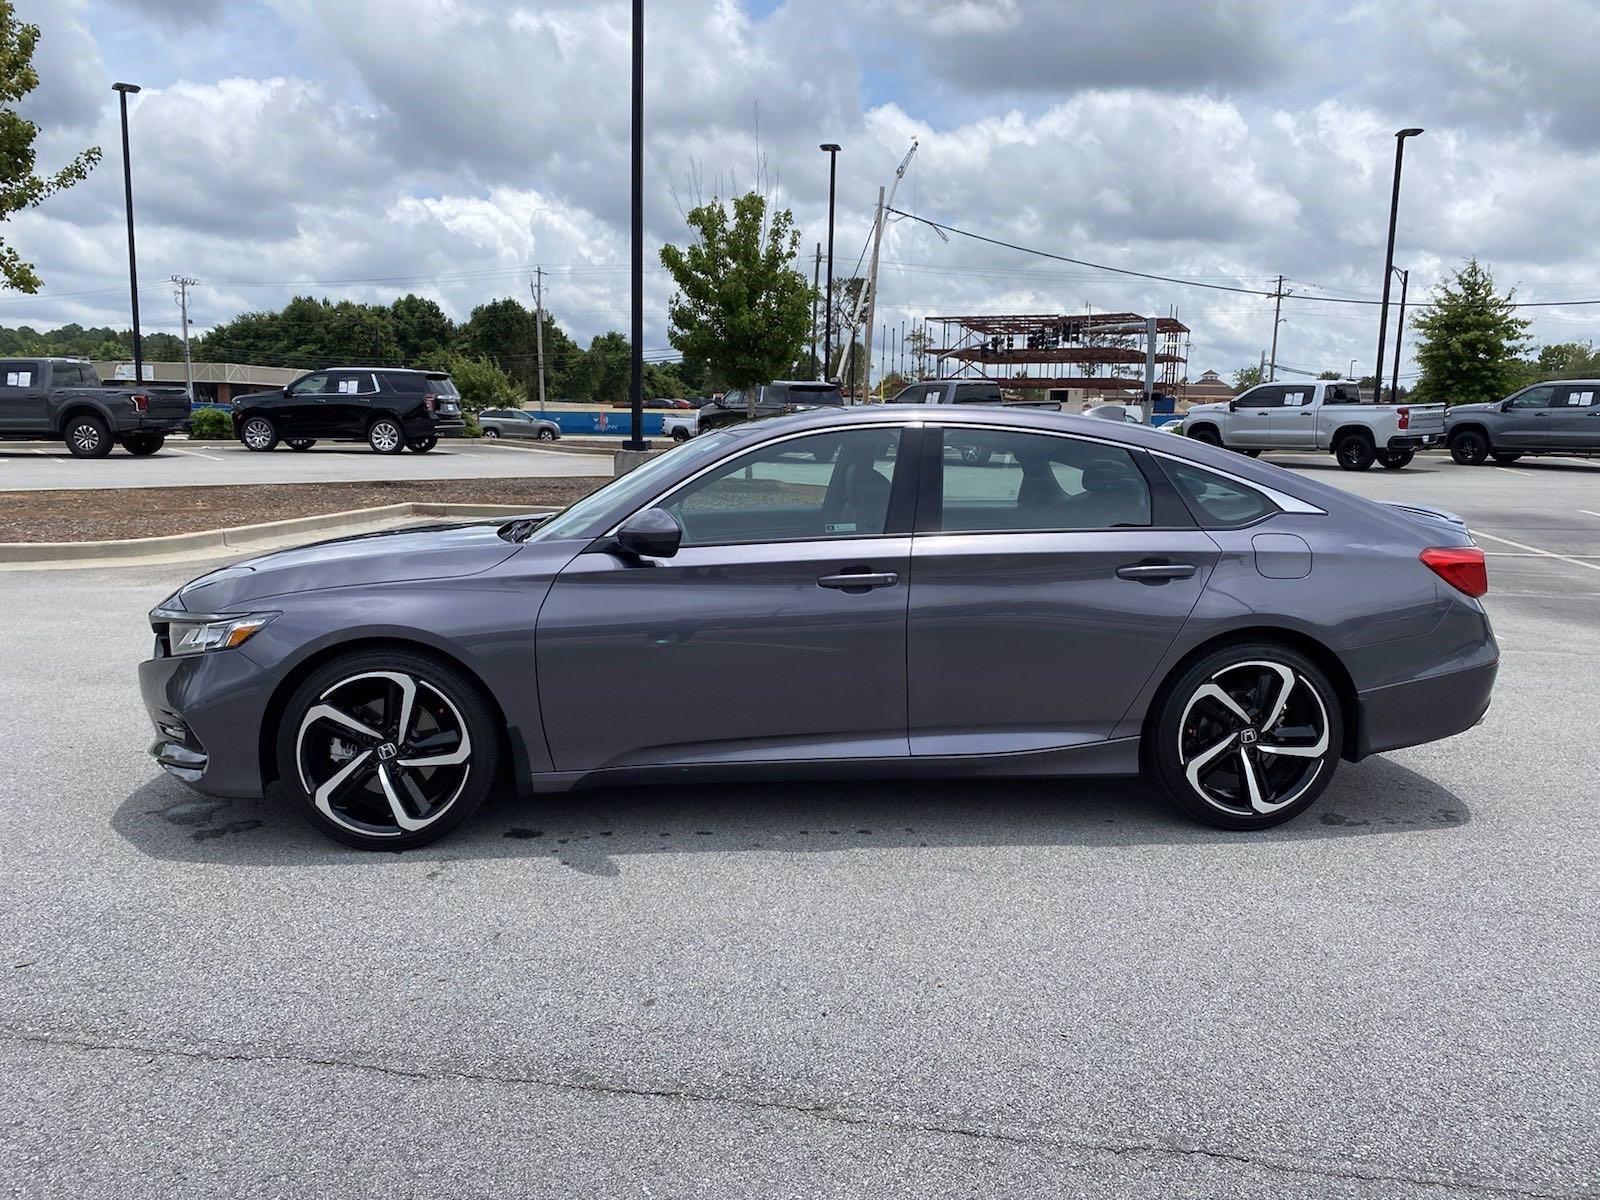 2020 Honda Accord Sedan Vehicle Photo in BUFORD, GA 30518